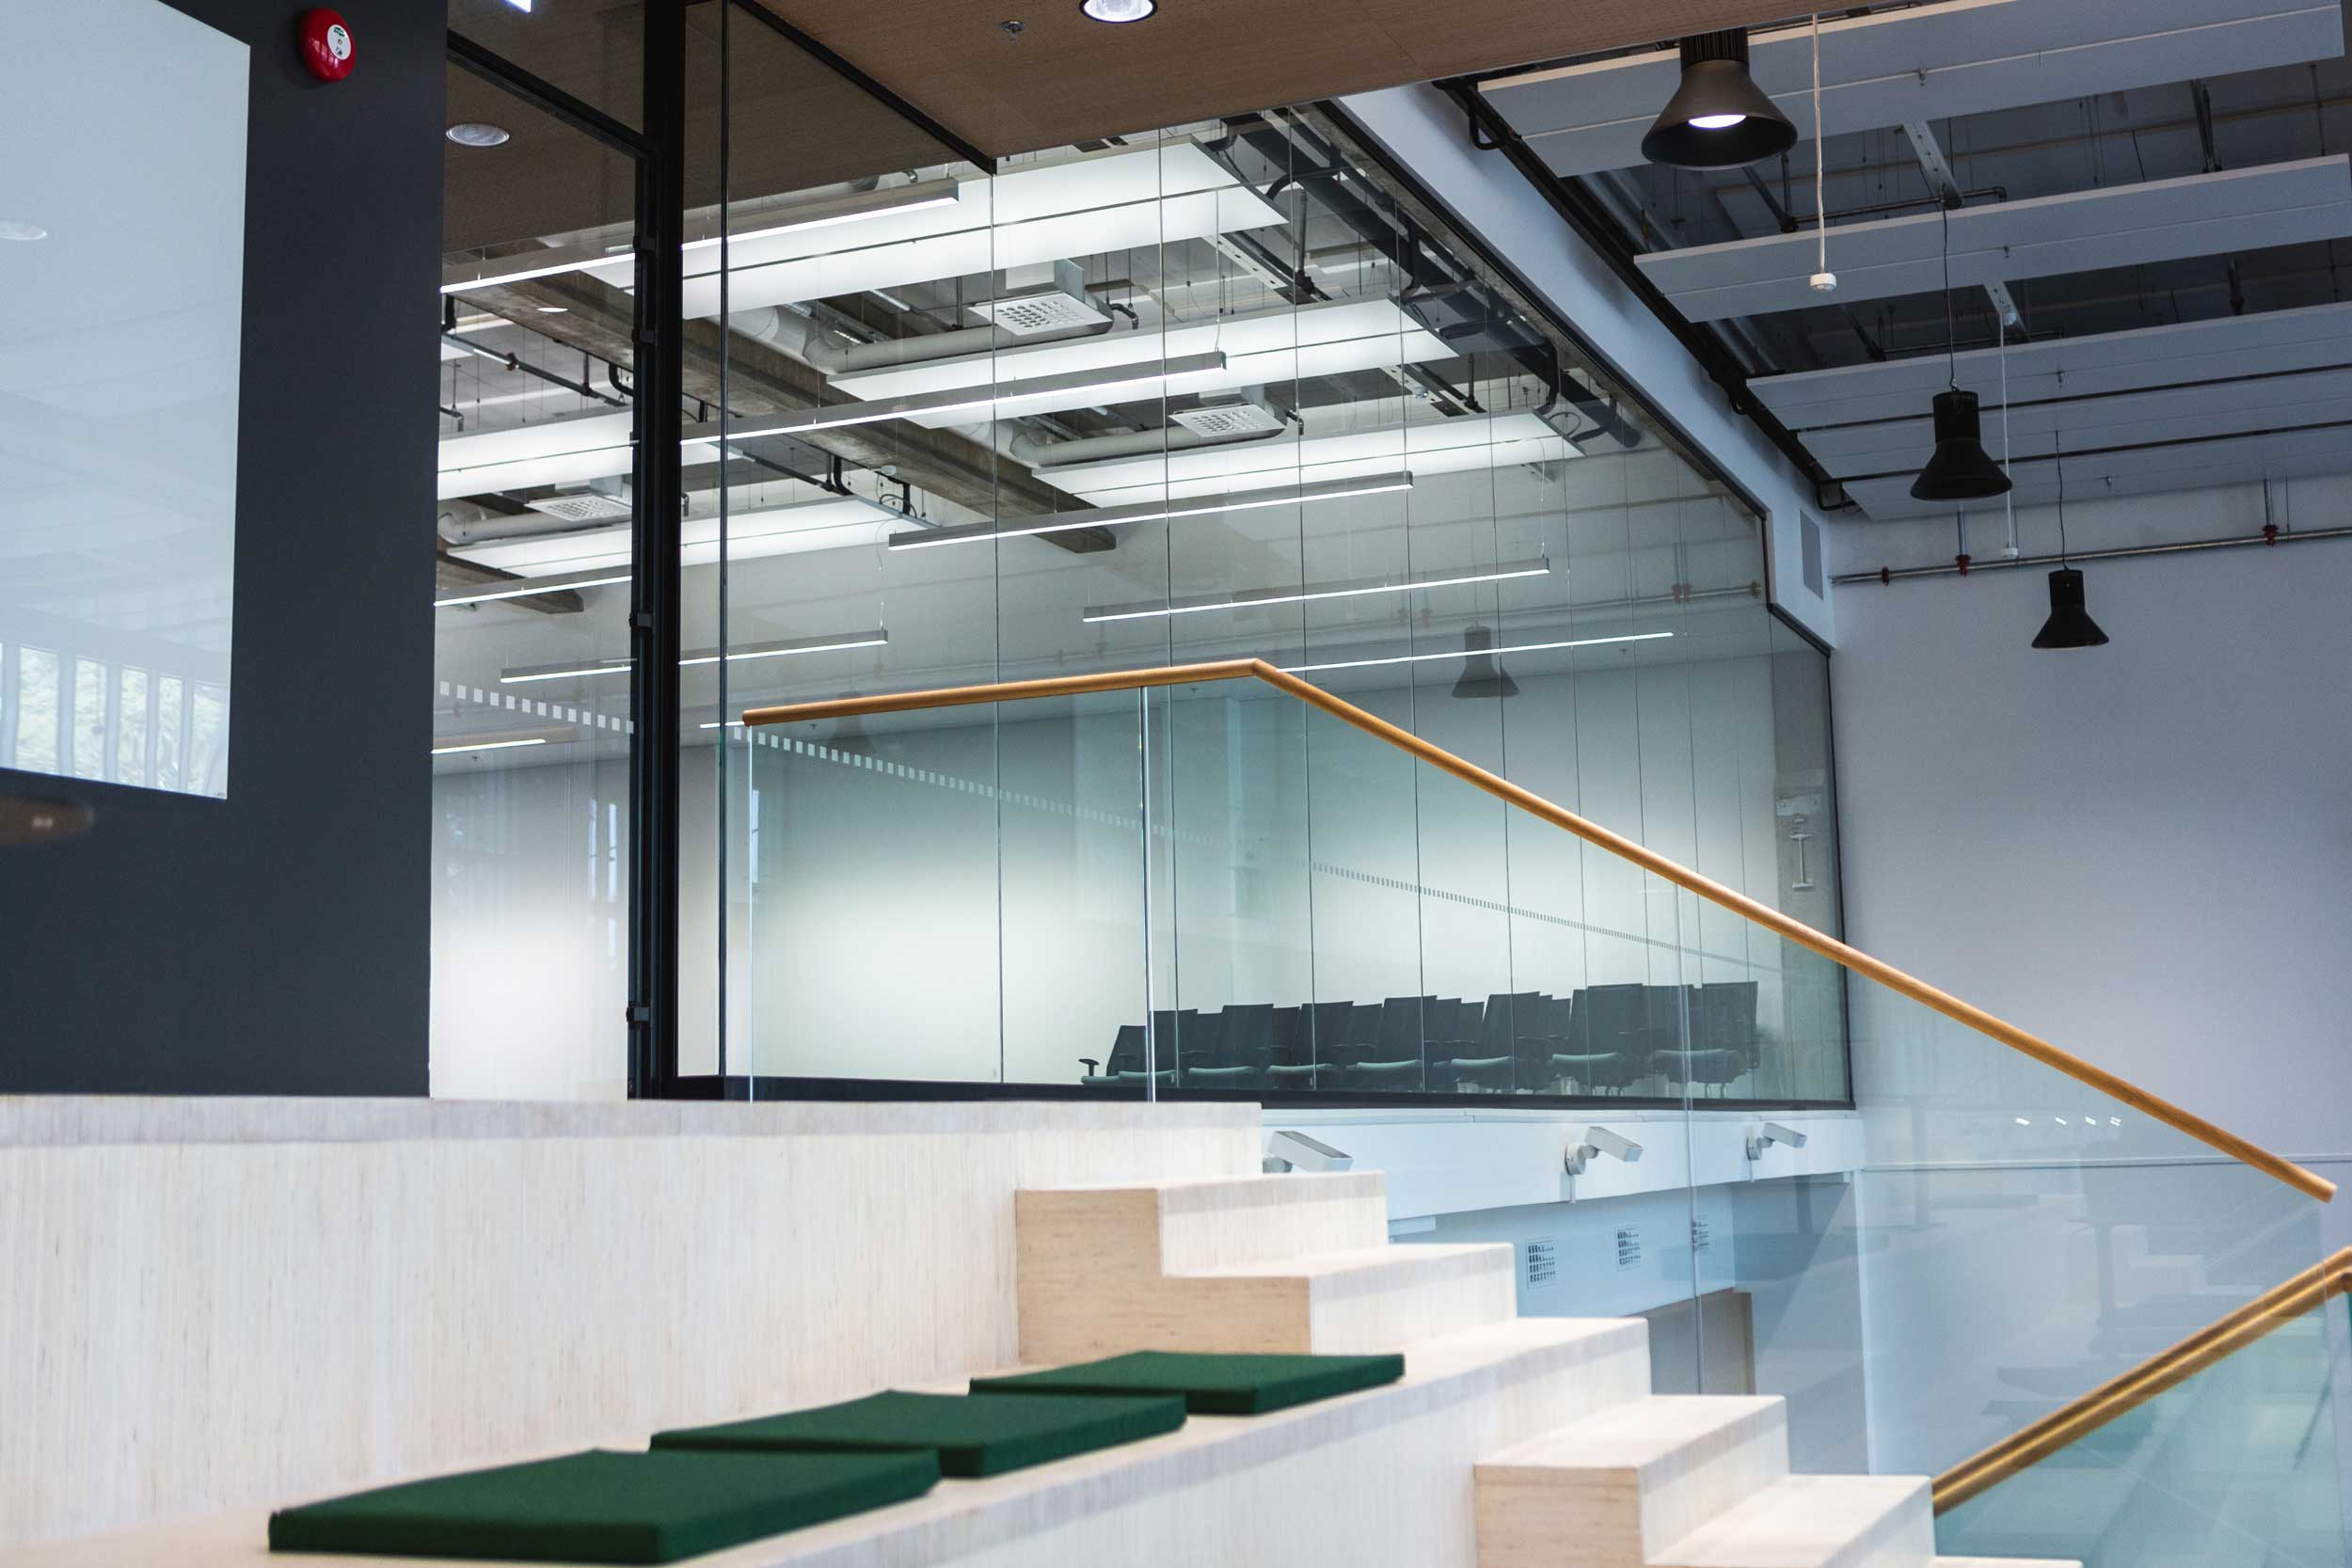 Scanmikael Office glass walls_High glass walls_ABB Vaasa, Finland